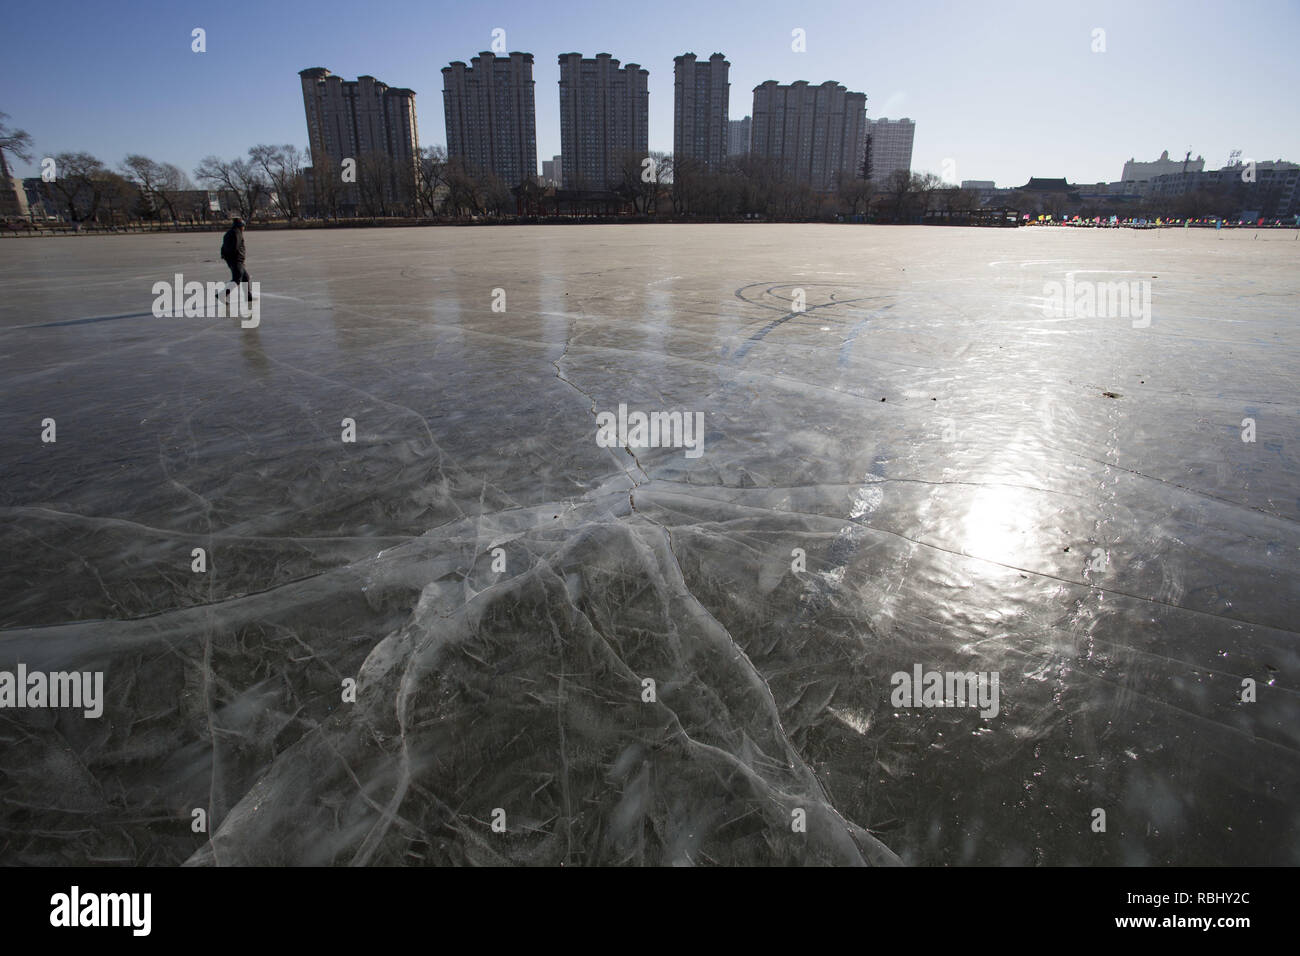 Jili, China. 10th Jan, 2019. Frozen lake at Beishan Park in northeast China's Jilin Province. Credit: SIPA ASIA/Pacific Press/Alamy Live News - Stock Image